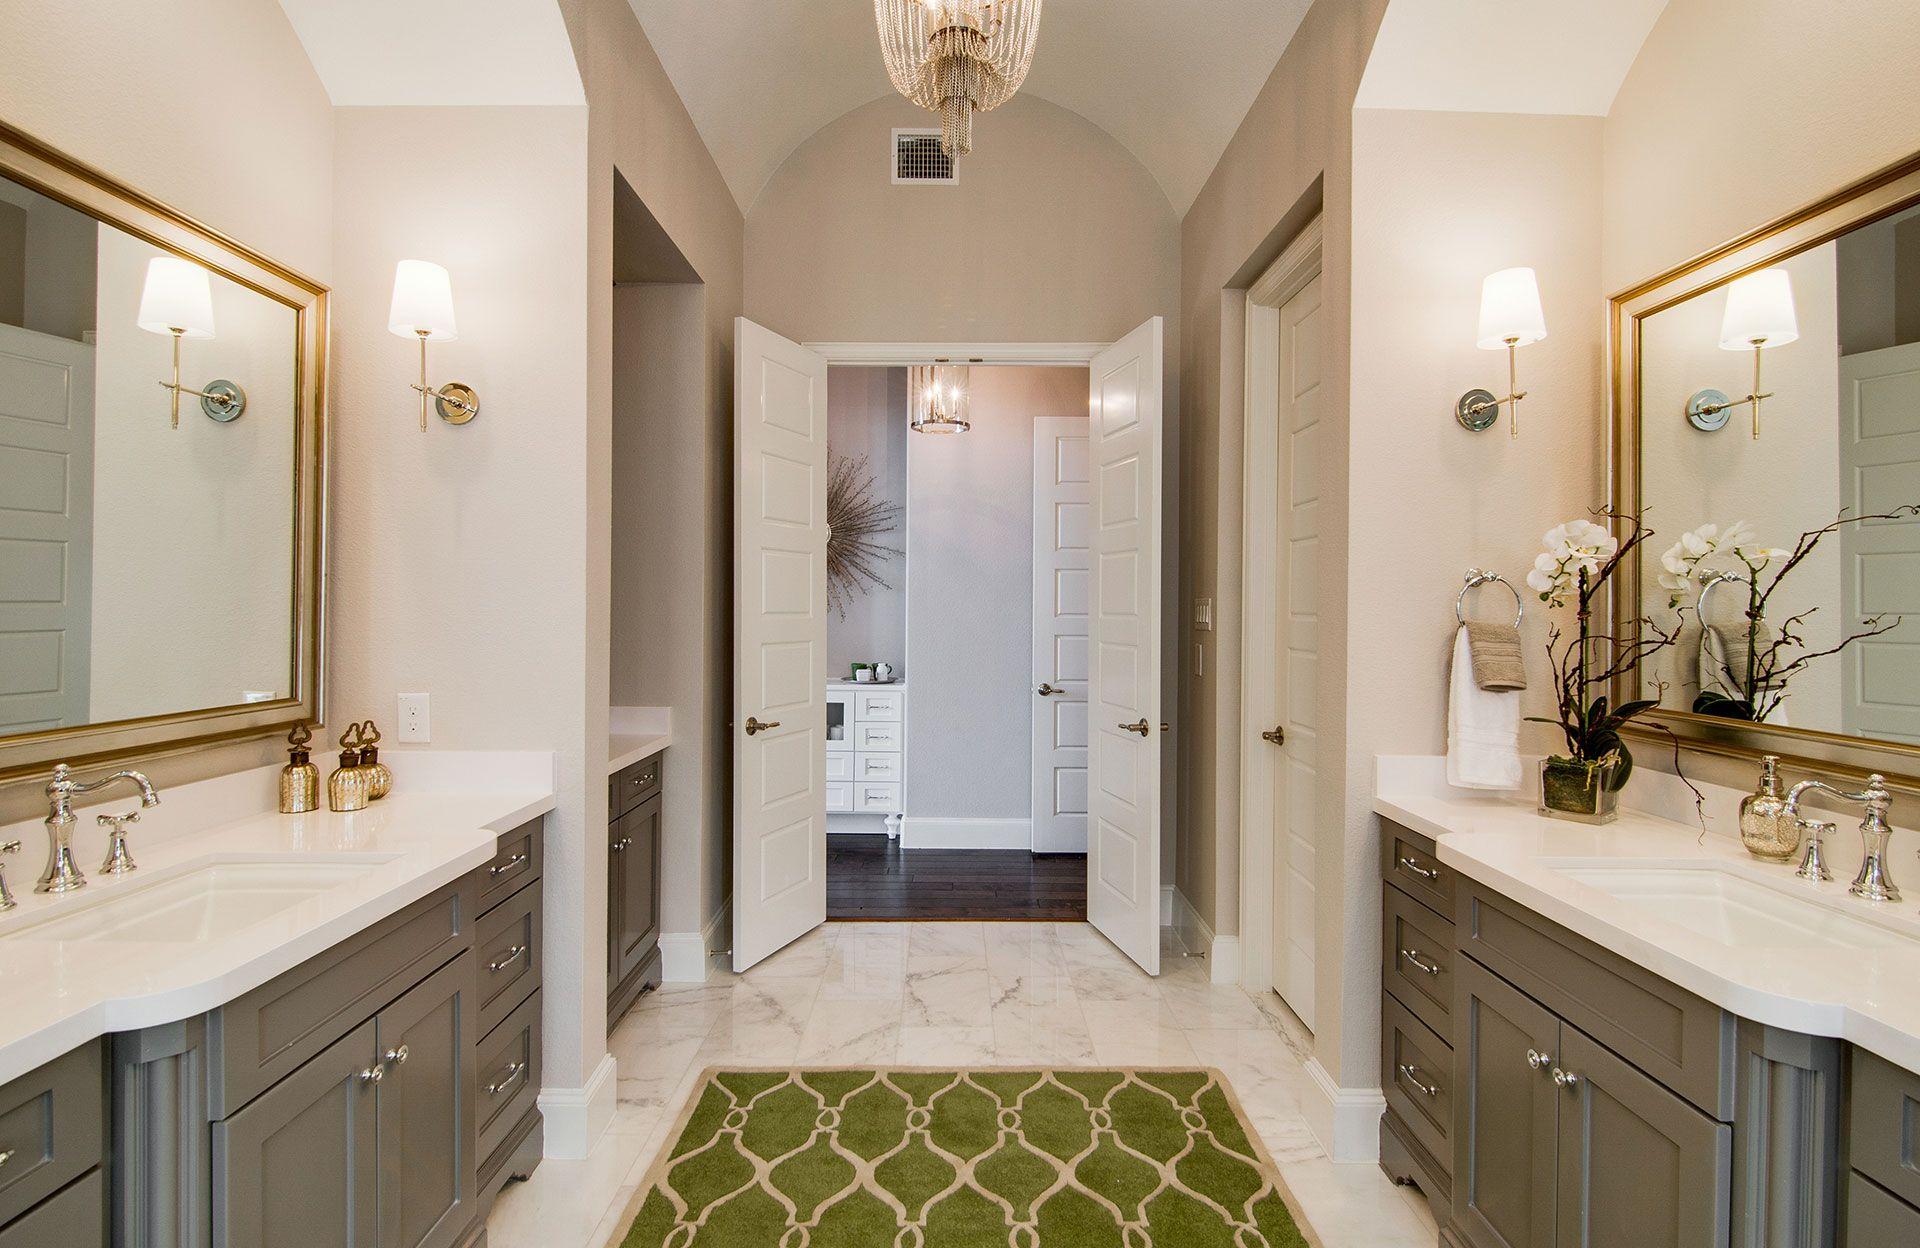 Bathroom featured in the Brinkley By Drees Custom Homes in Dallas, TX